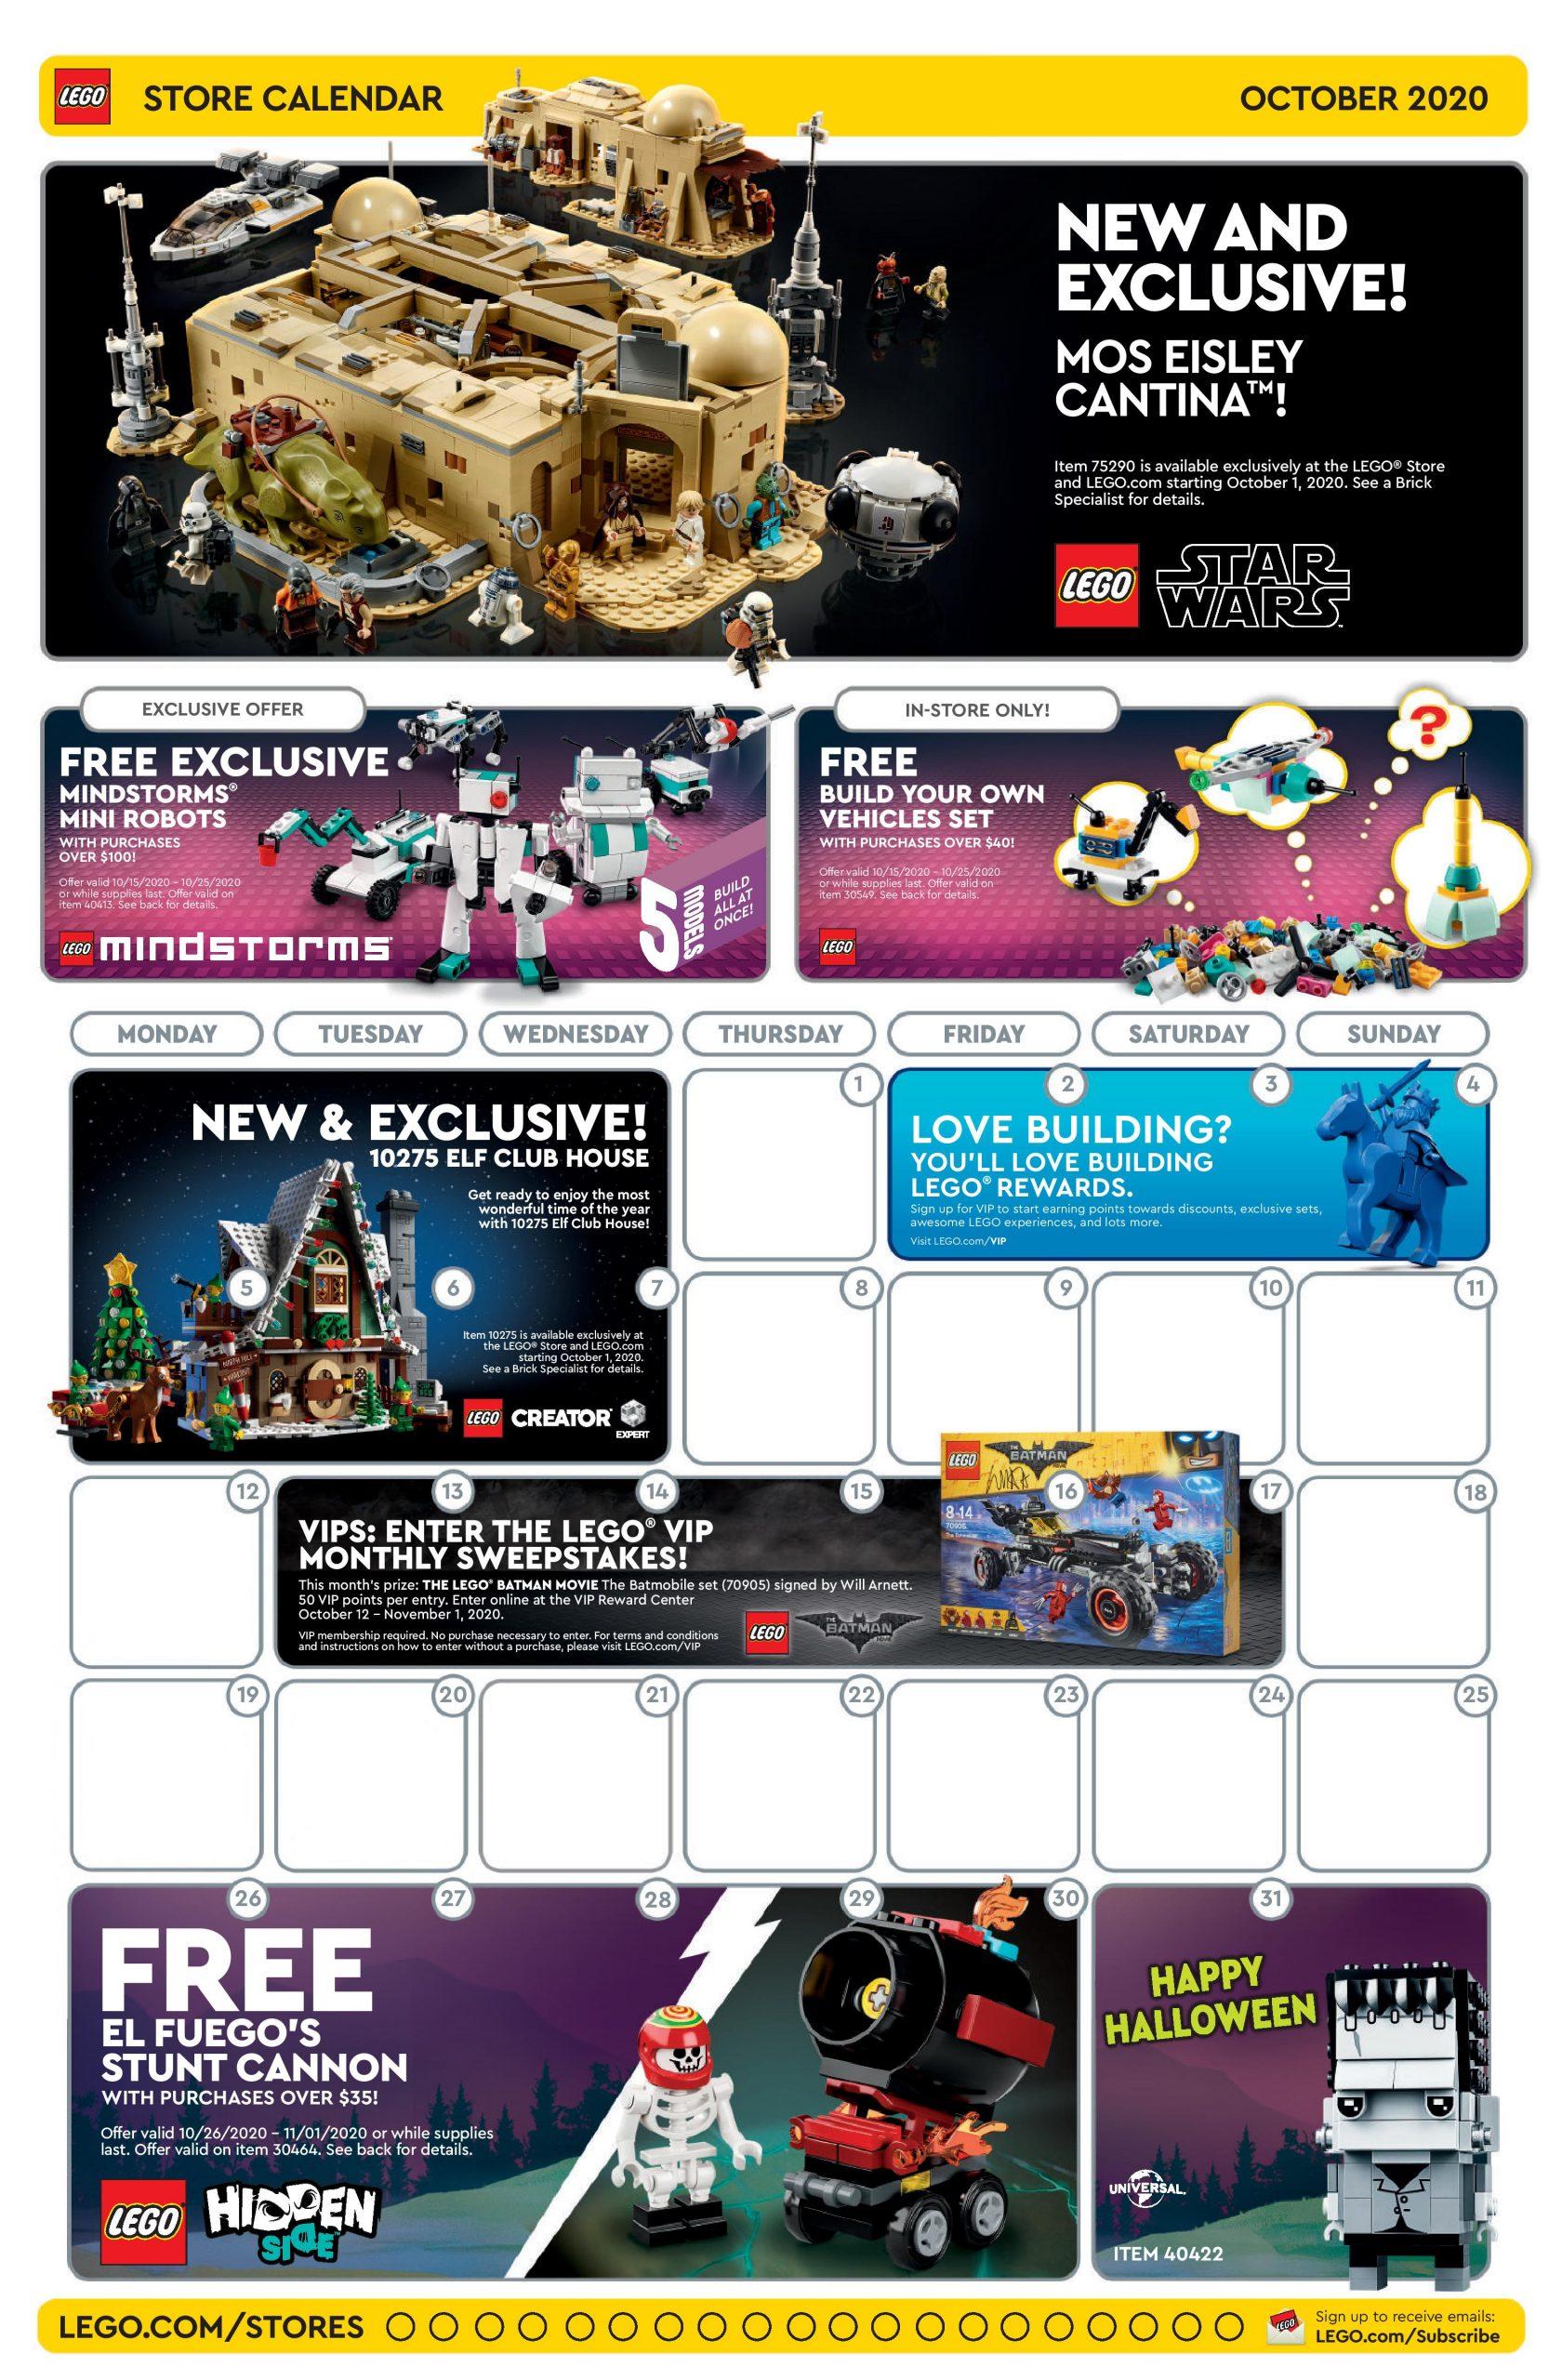 Lego October 2022 Calendar.Lego October 2020 Store Calendar Promotions Events The Brick Fan